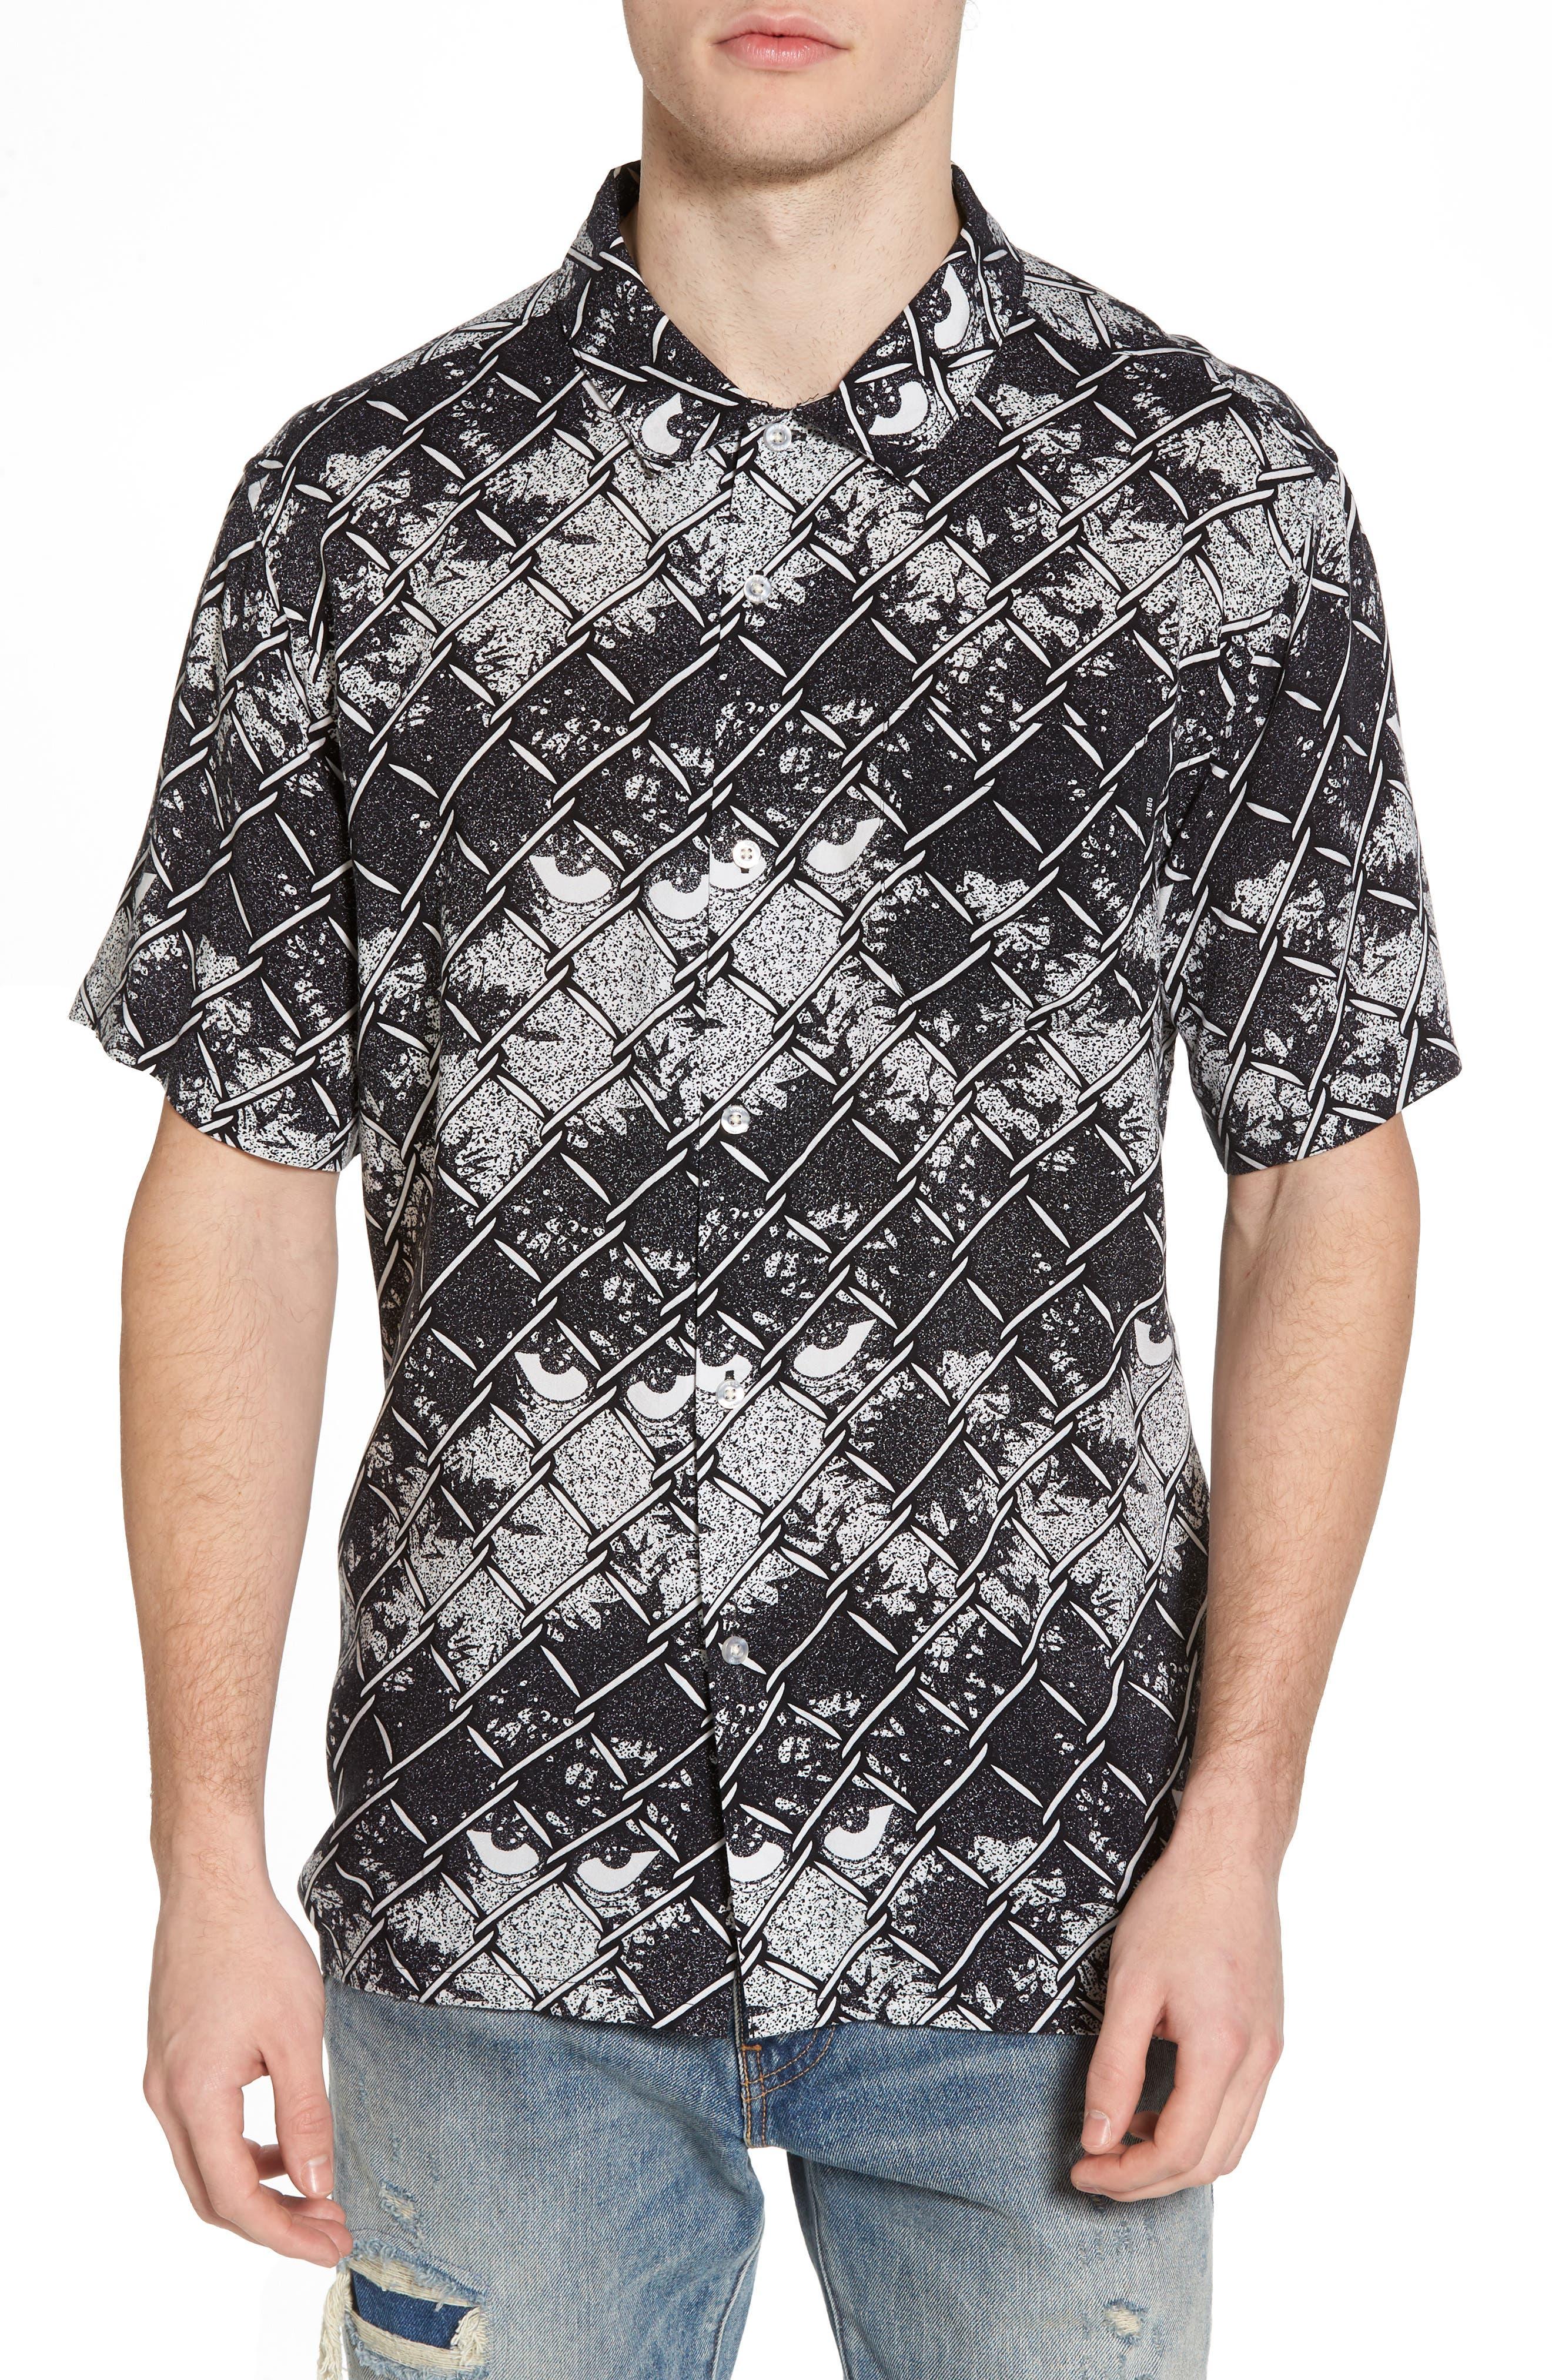 Gatekeeper Short Sleeve Shirt,                         Main,                         color, Black Multi